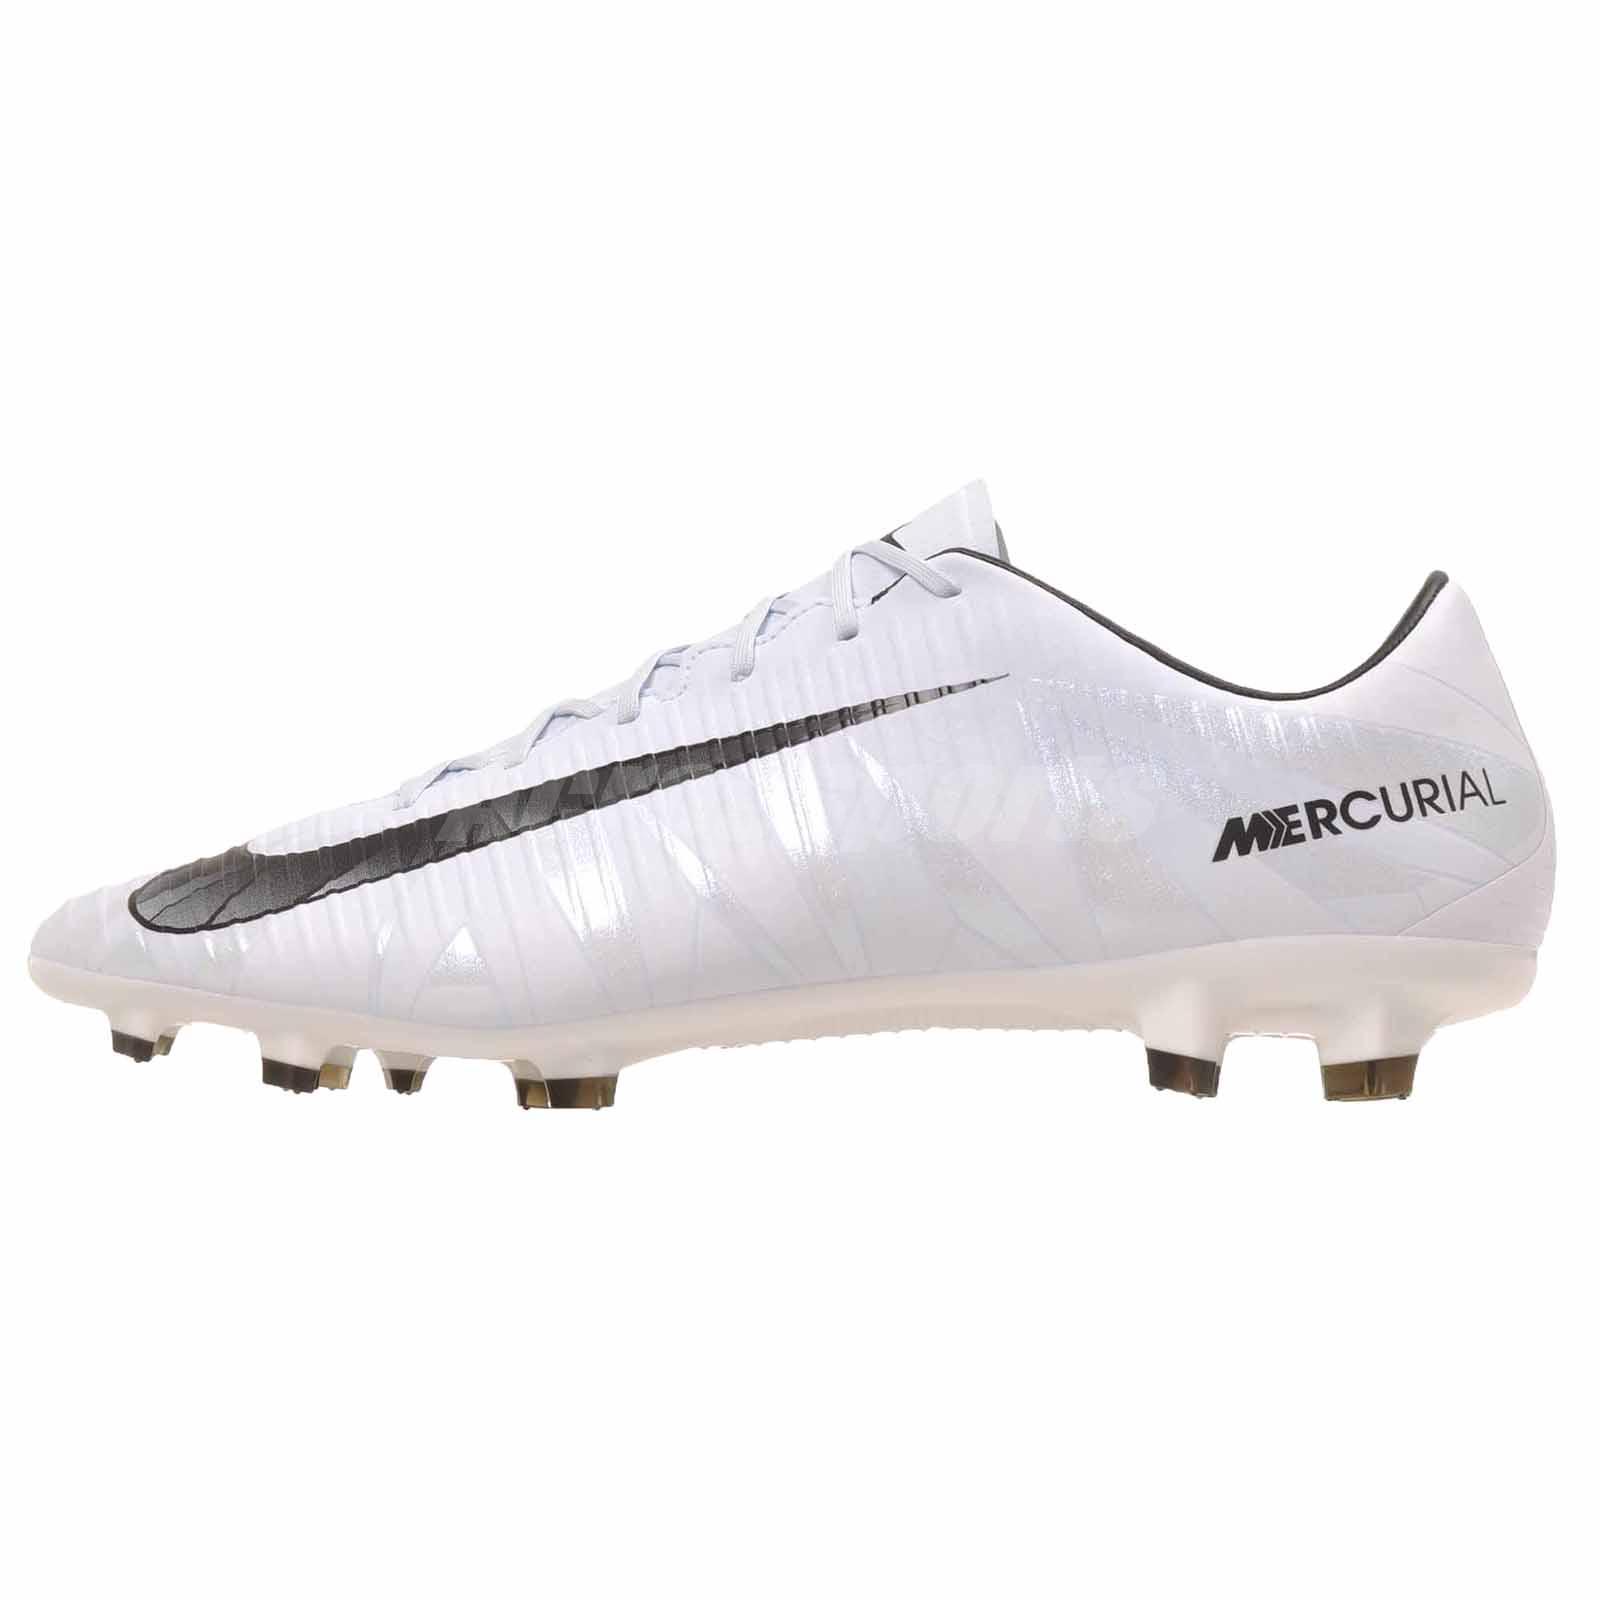 ecedde2445f3 ... greece nike mercurial veloce iii cr7 fg soccer mens ronaldo shoes blue  tint 858736 401 af417 ...